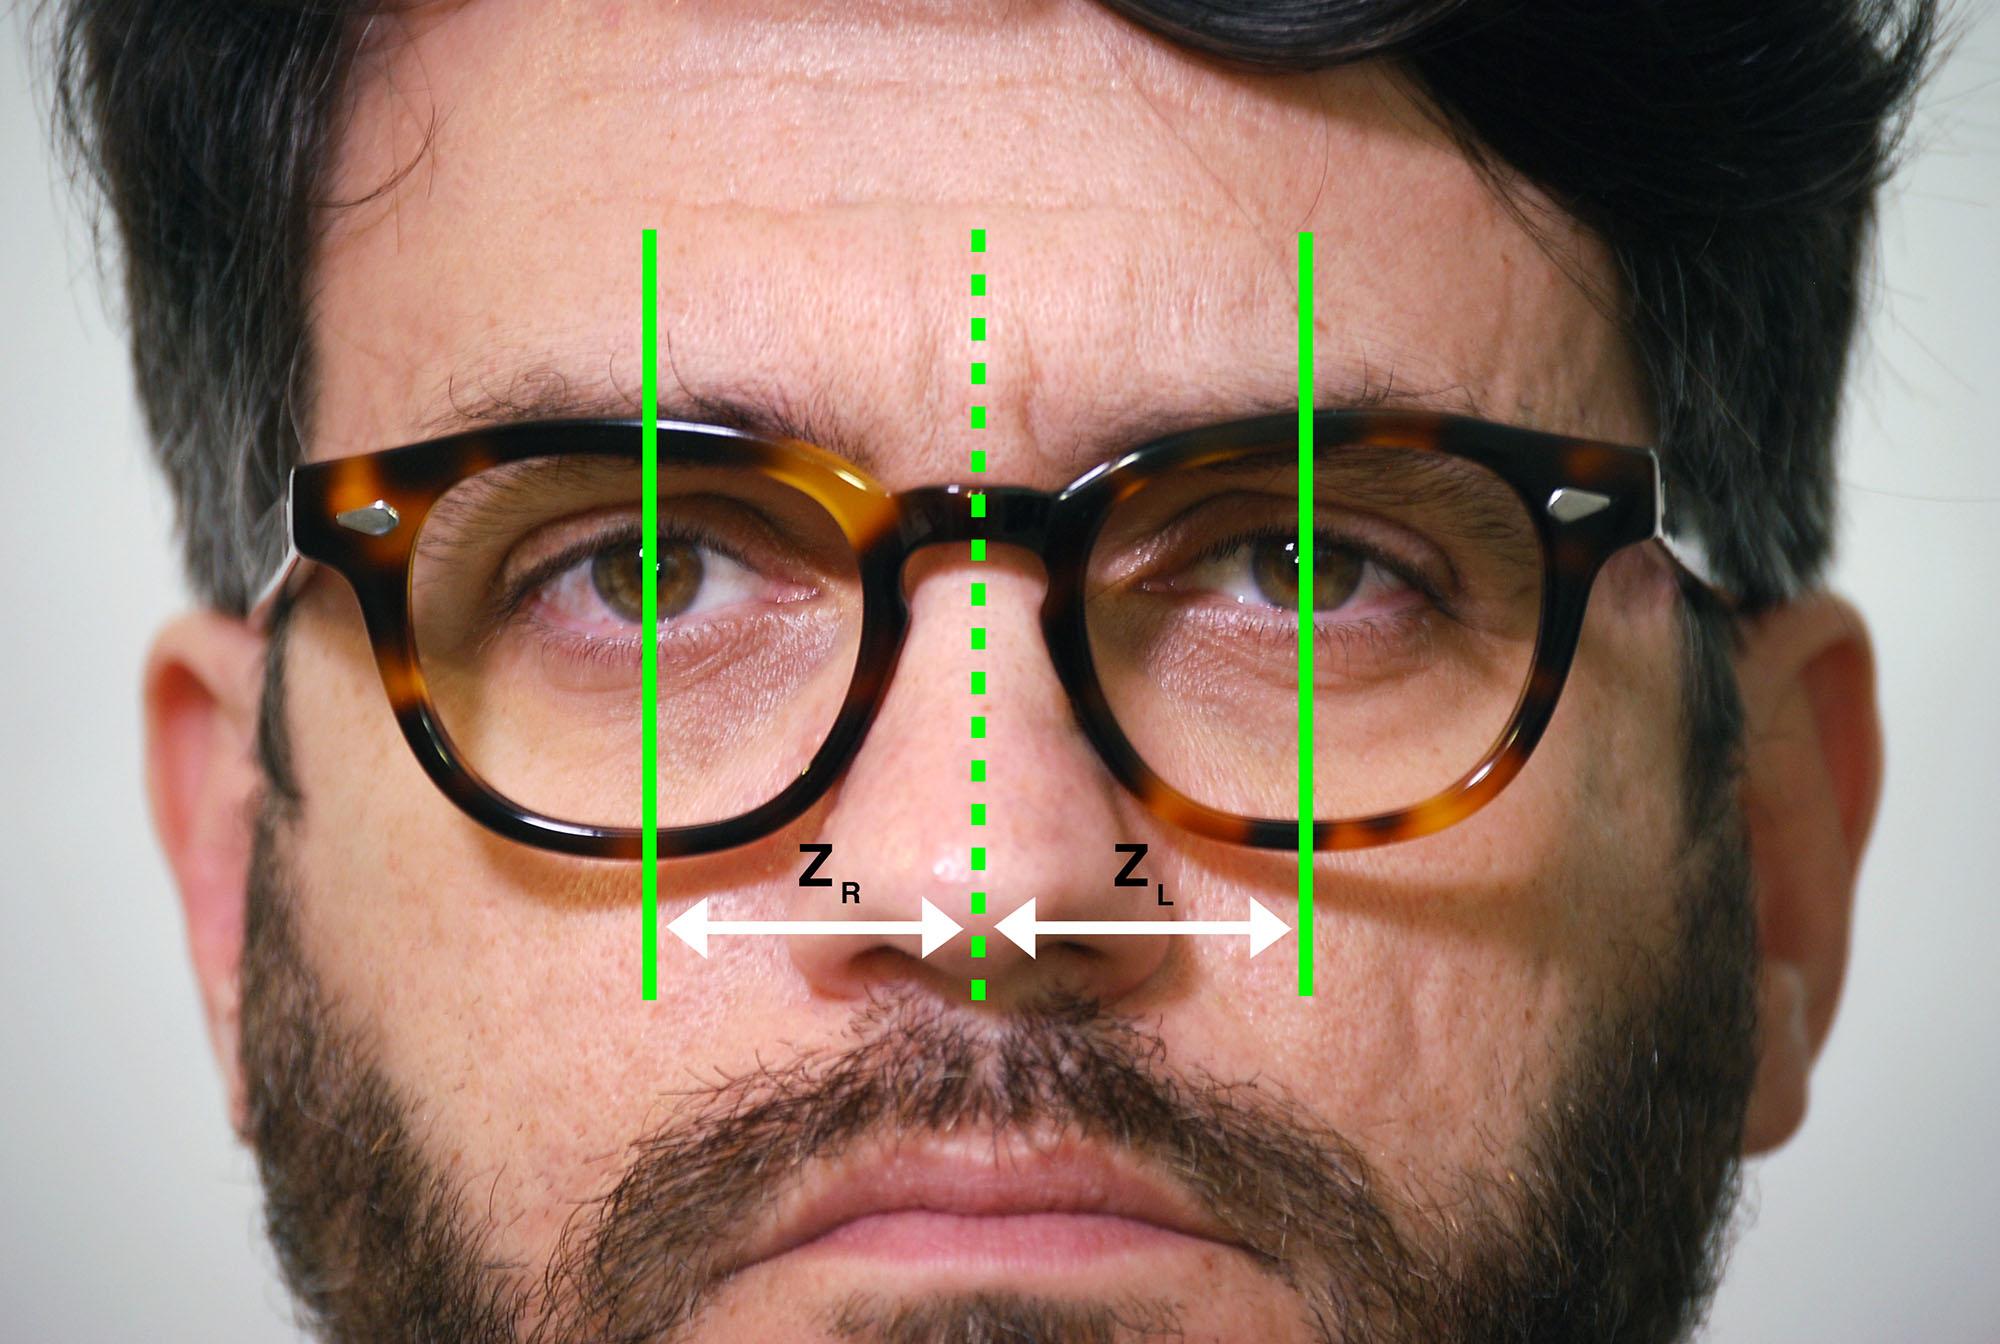 I parametri biometrici per le lenti progressive individuali